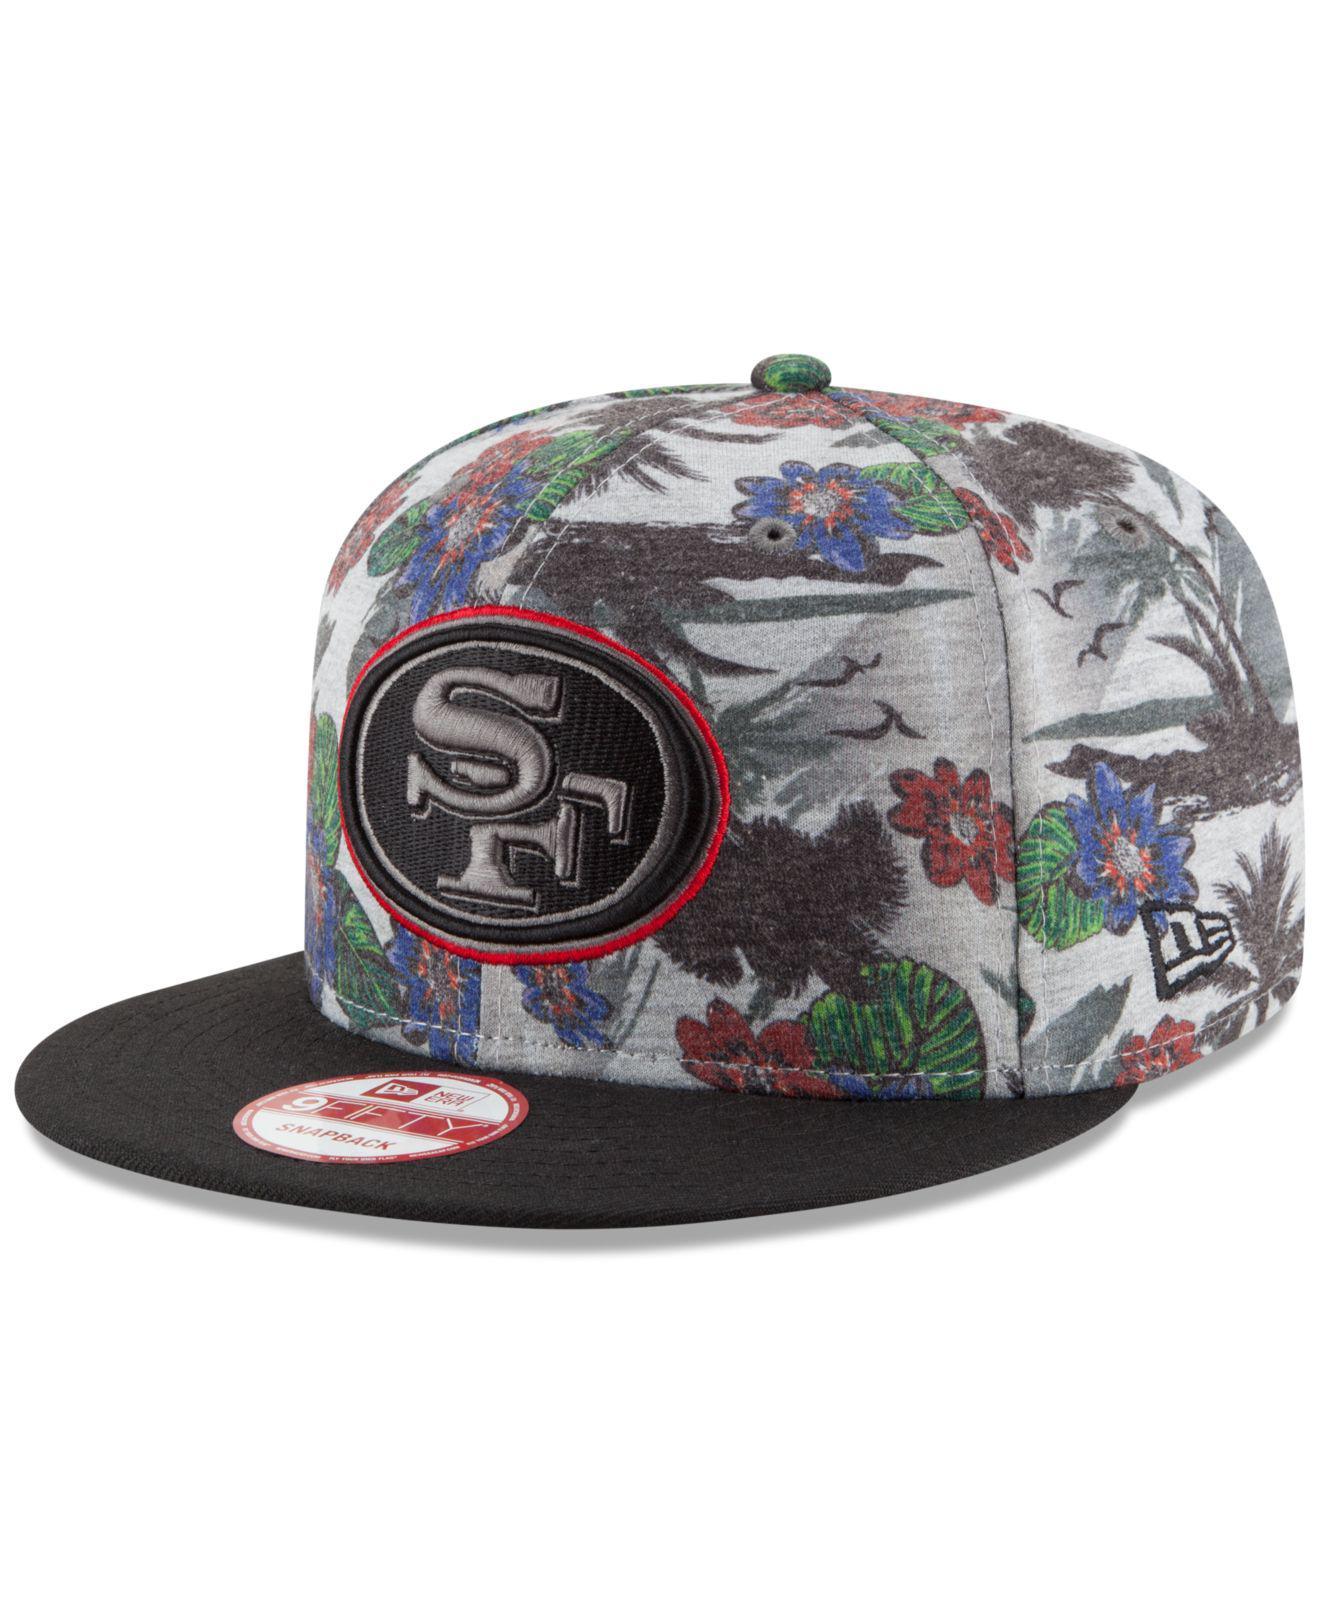 size 40 710c6 ab32f ... good lyst ktz san francisco 49ers cool breeze trop 9fifty snapback cap  98f0e 12a9a